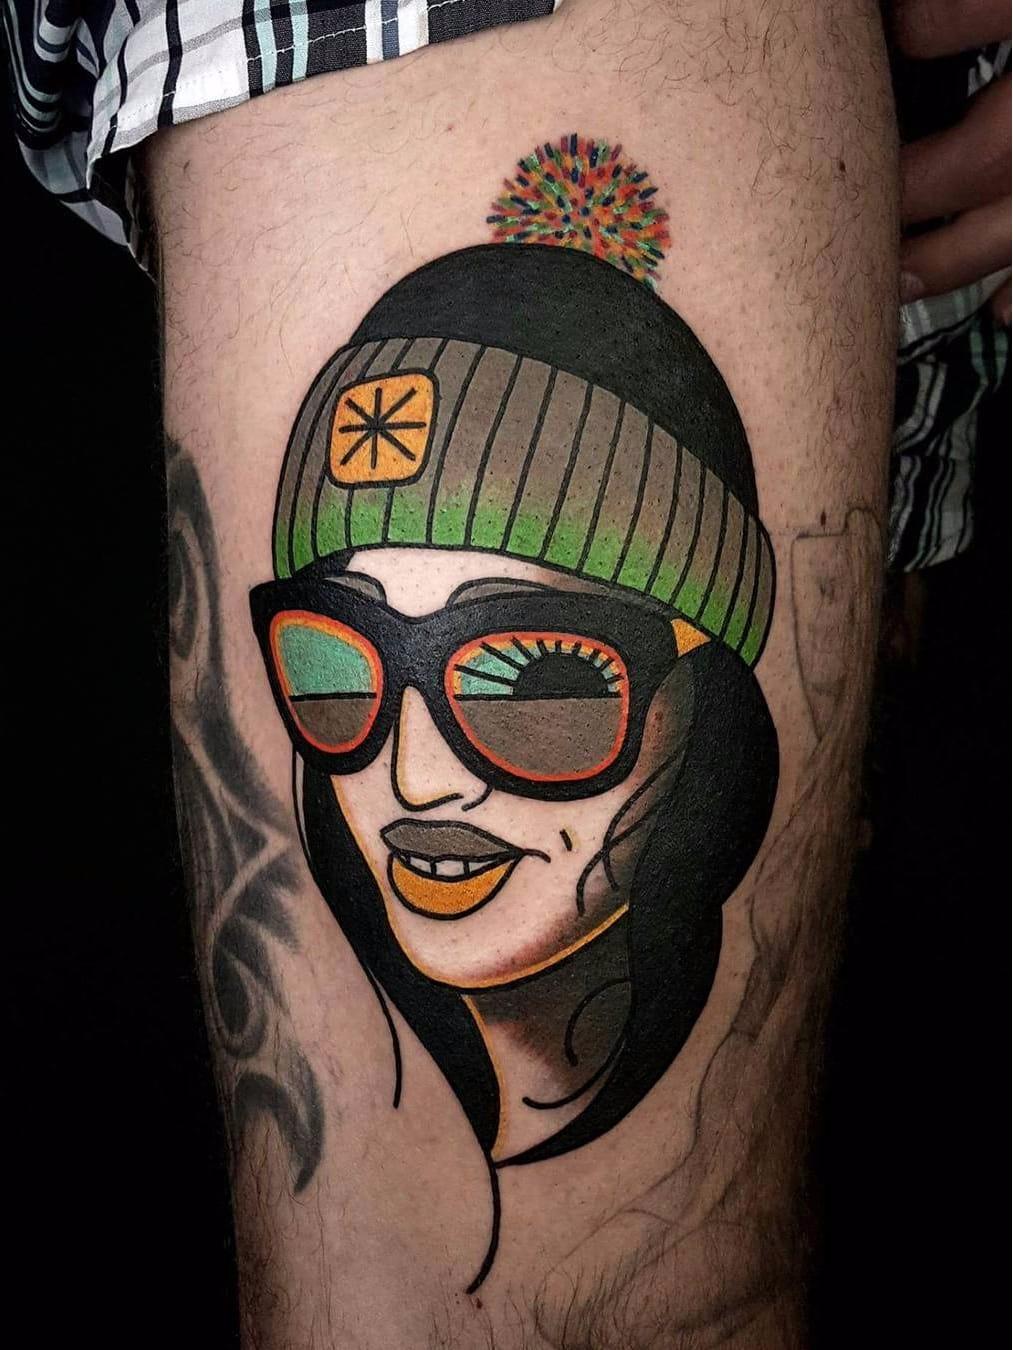 Por David Sz #DavidSz #gringo #psychedelic #psicodelico #colorido #colorful #woman #mulher #sunglass #oculosdesol #sun #sol #degrade #dark